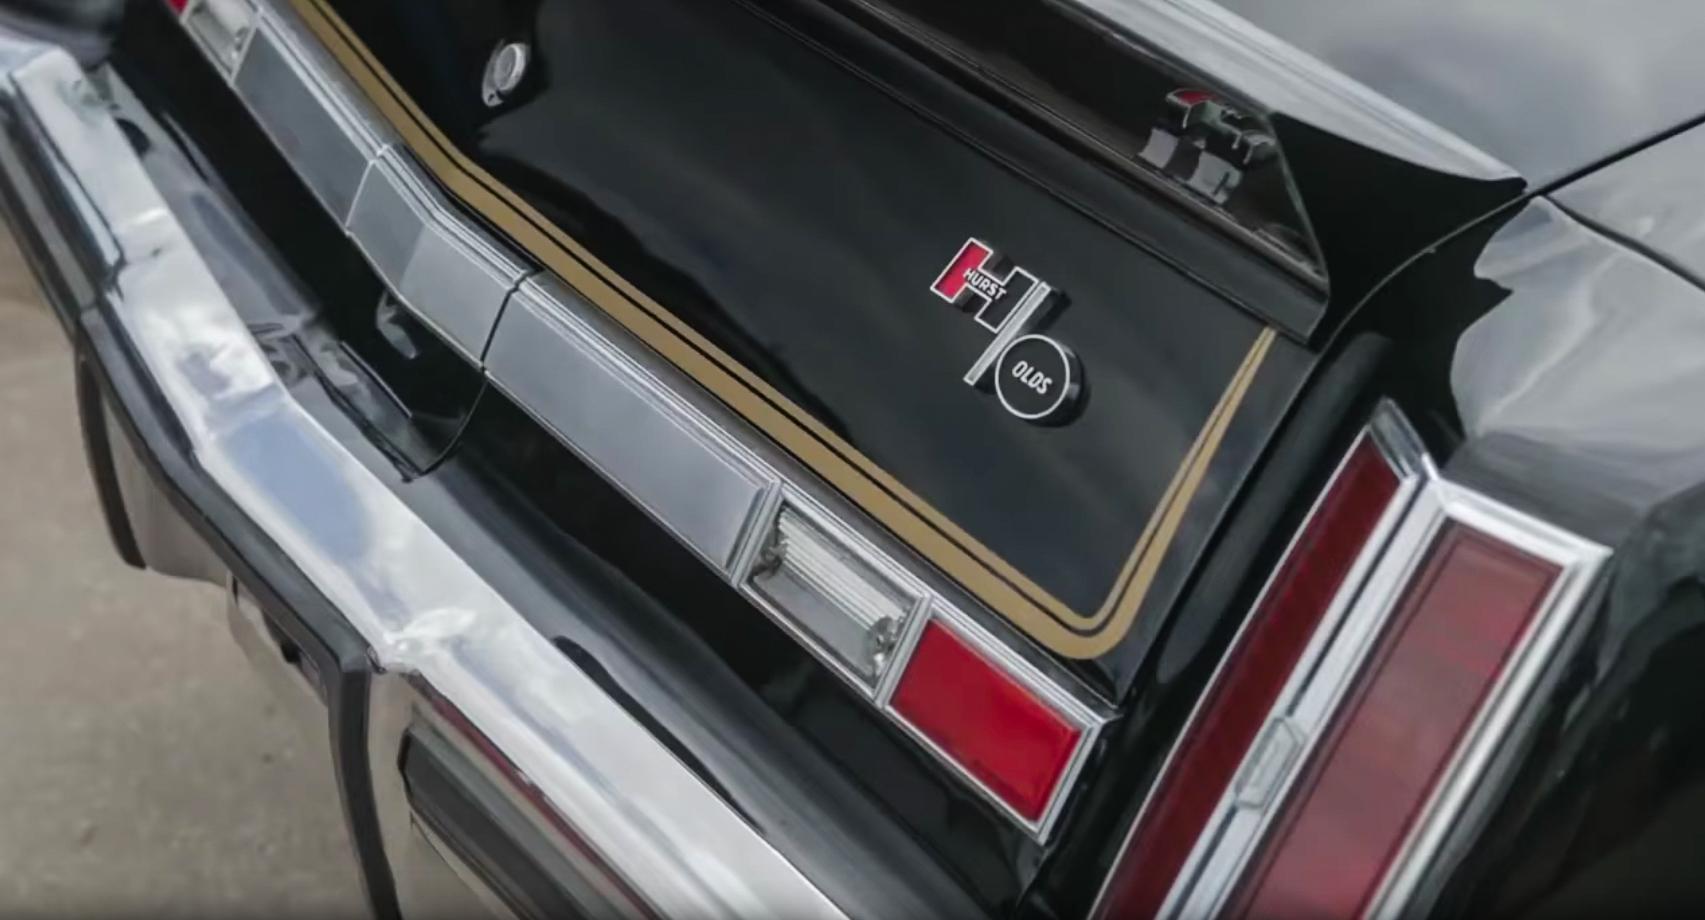 1975 Hurst Oldsmobile Colonnade W-30 rear badging